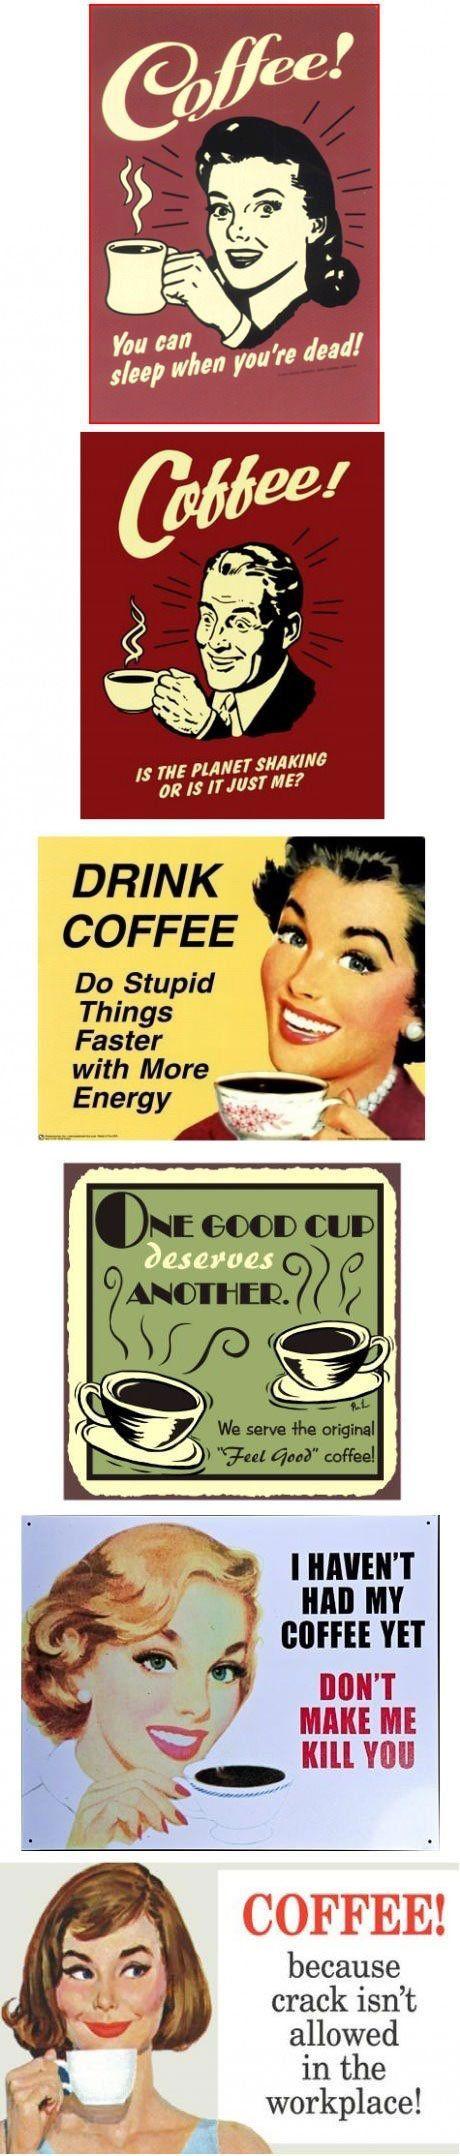 How I feel every morning!